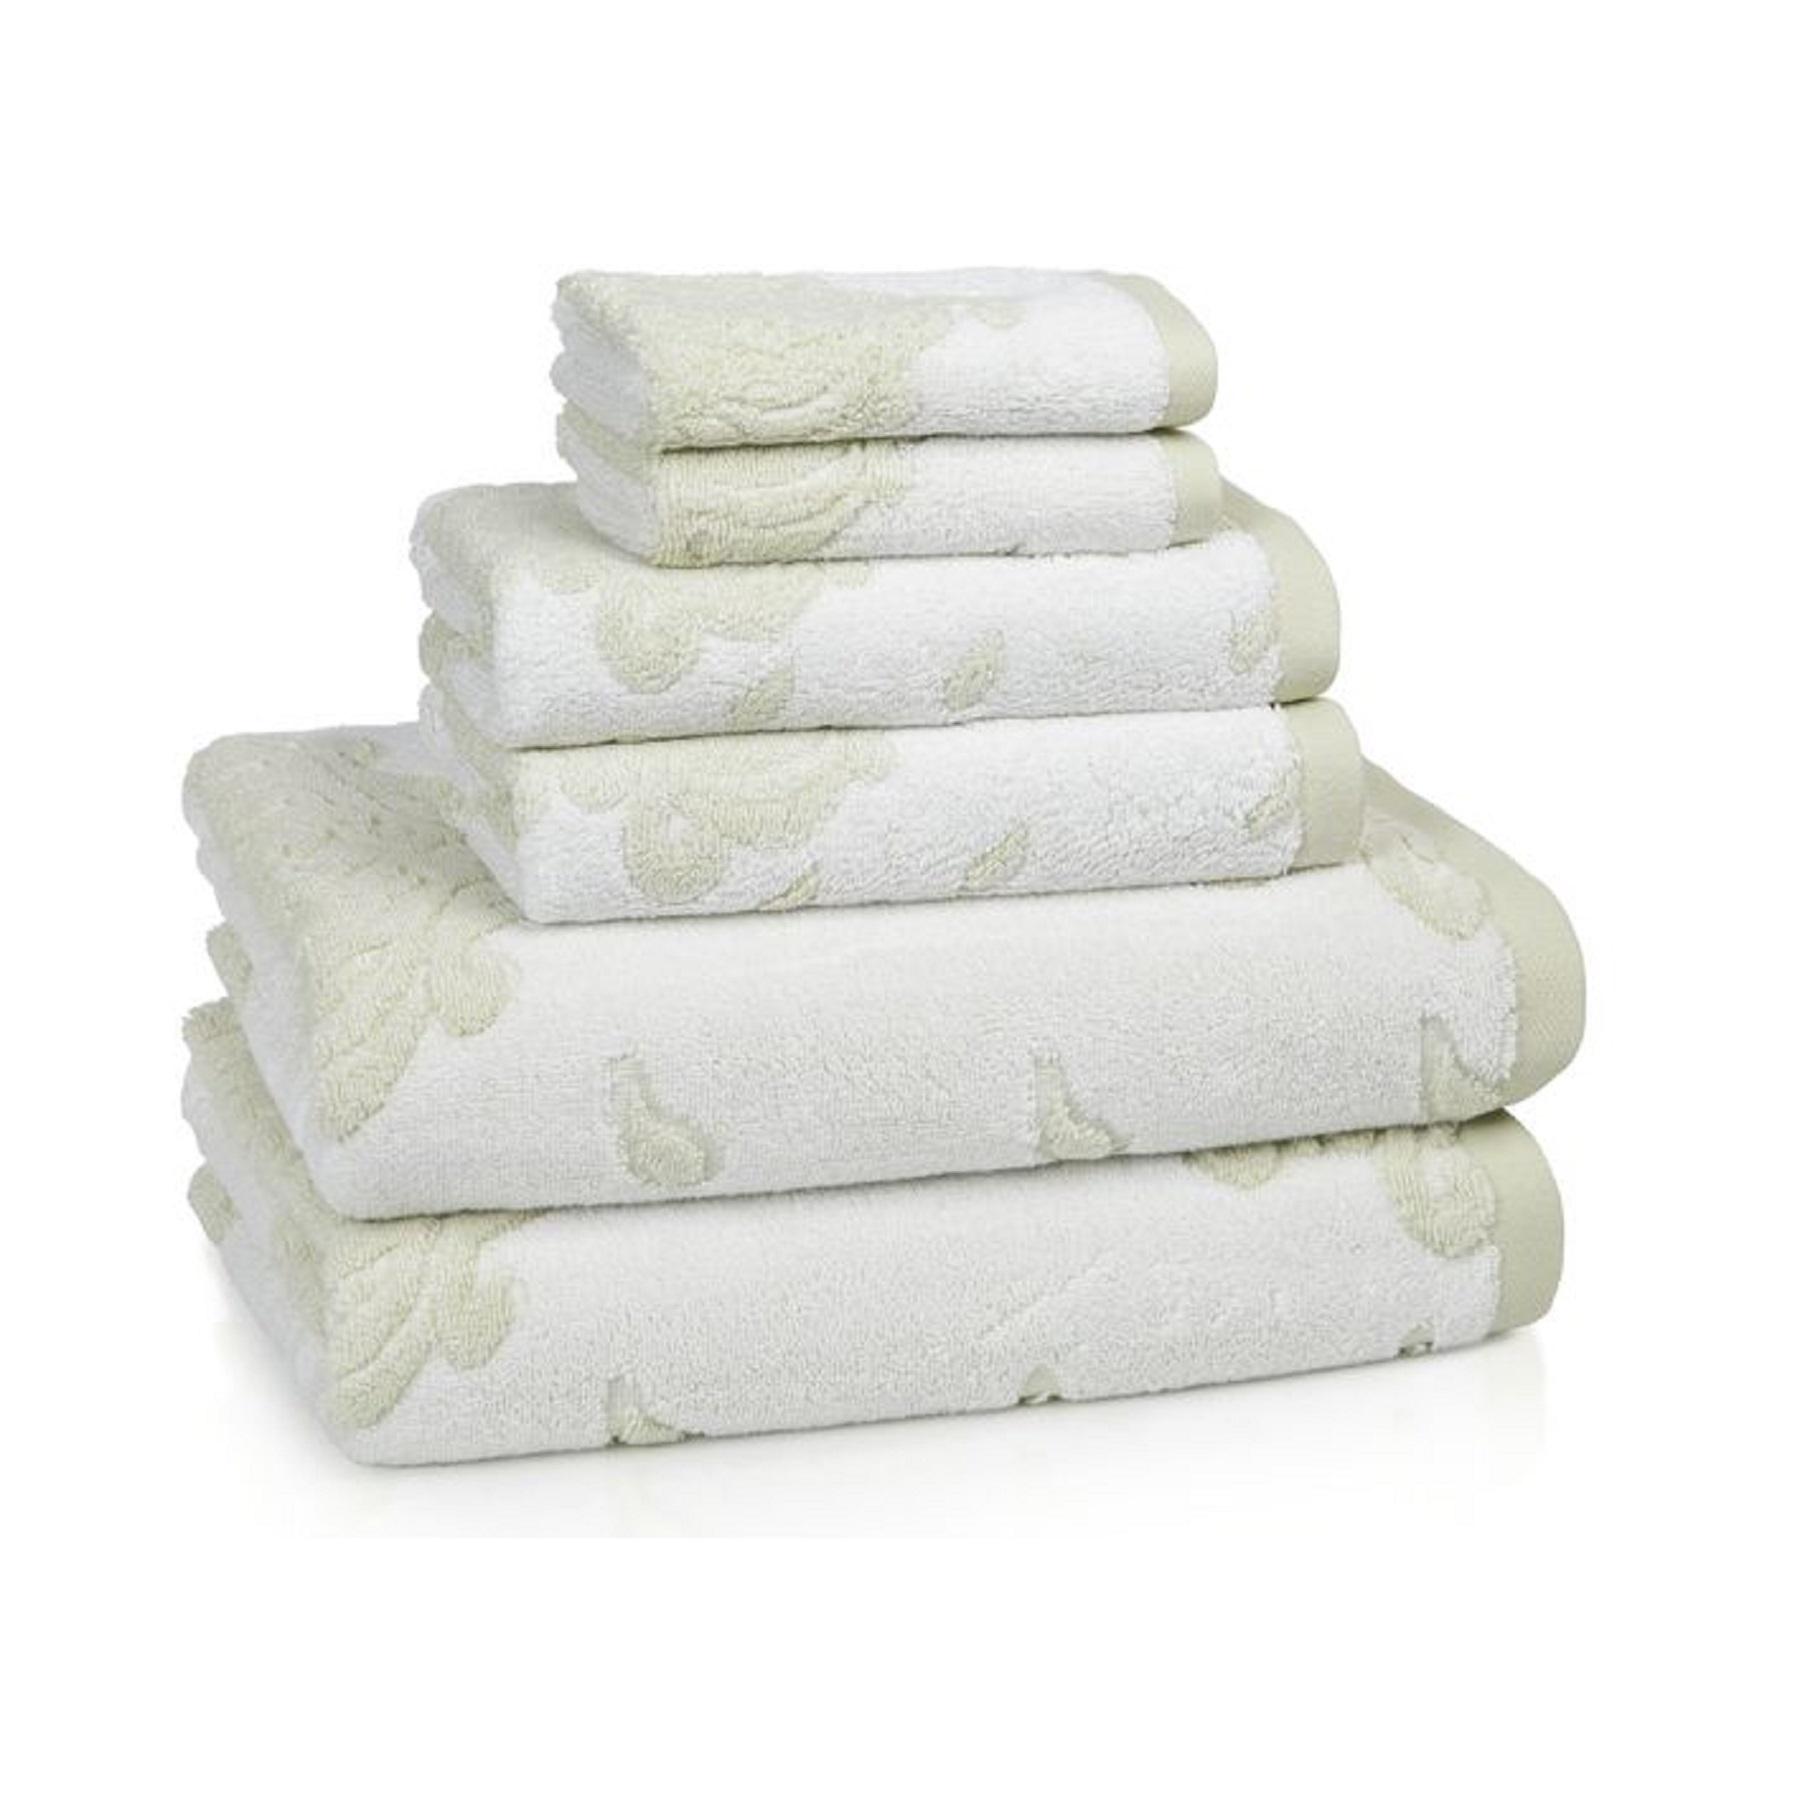 Коврики для ванной Элитный коврик для ванной Roma Sage от Kassatex elitnyy-kovrik-dlya-vannoy-roma-sage-ot-kassatex-portugaliya.jpg